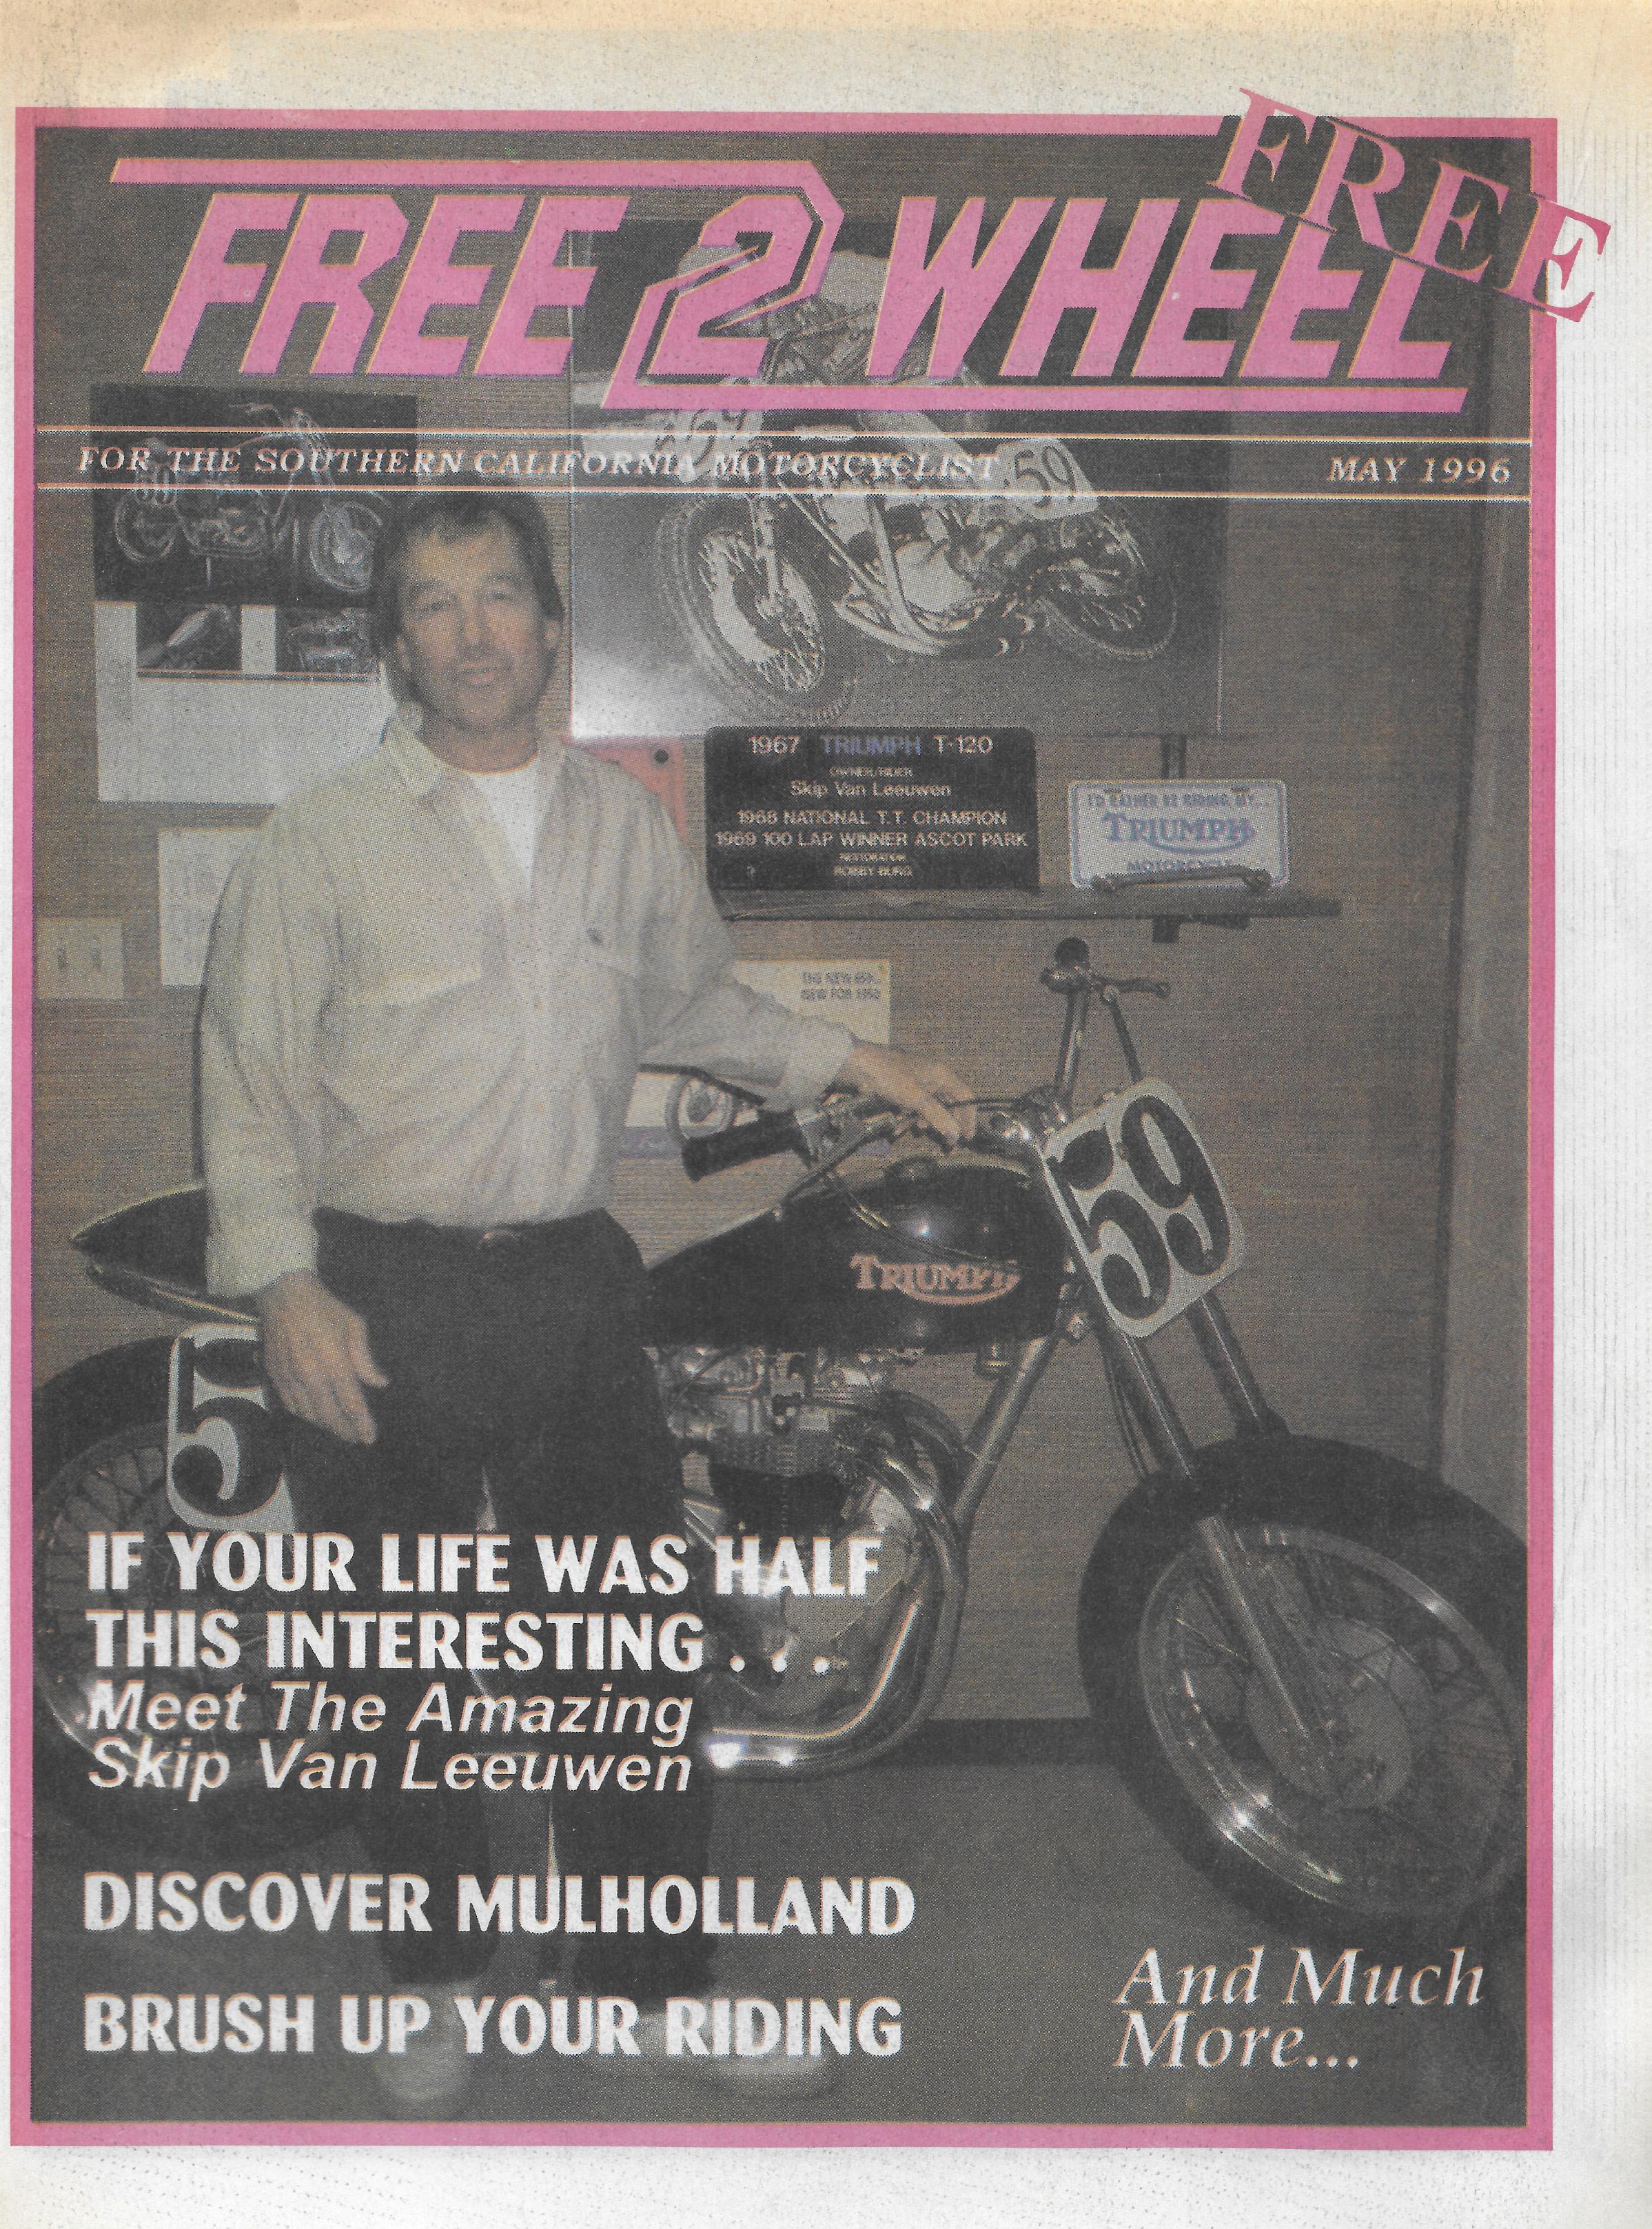 Free 2 Wheel-1.jpg